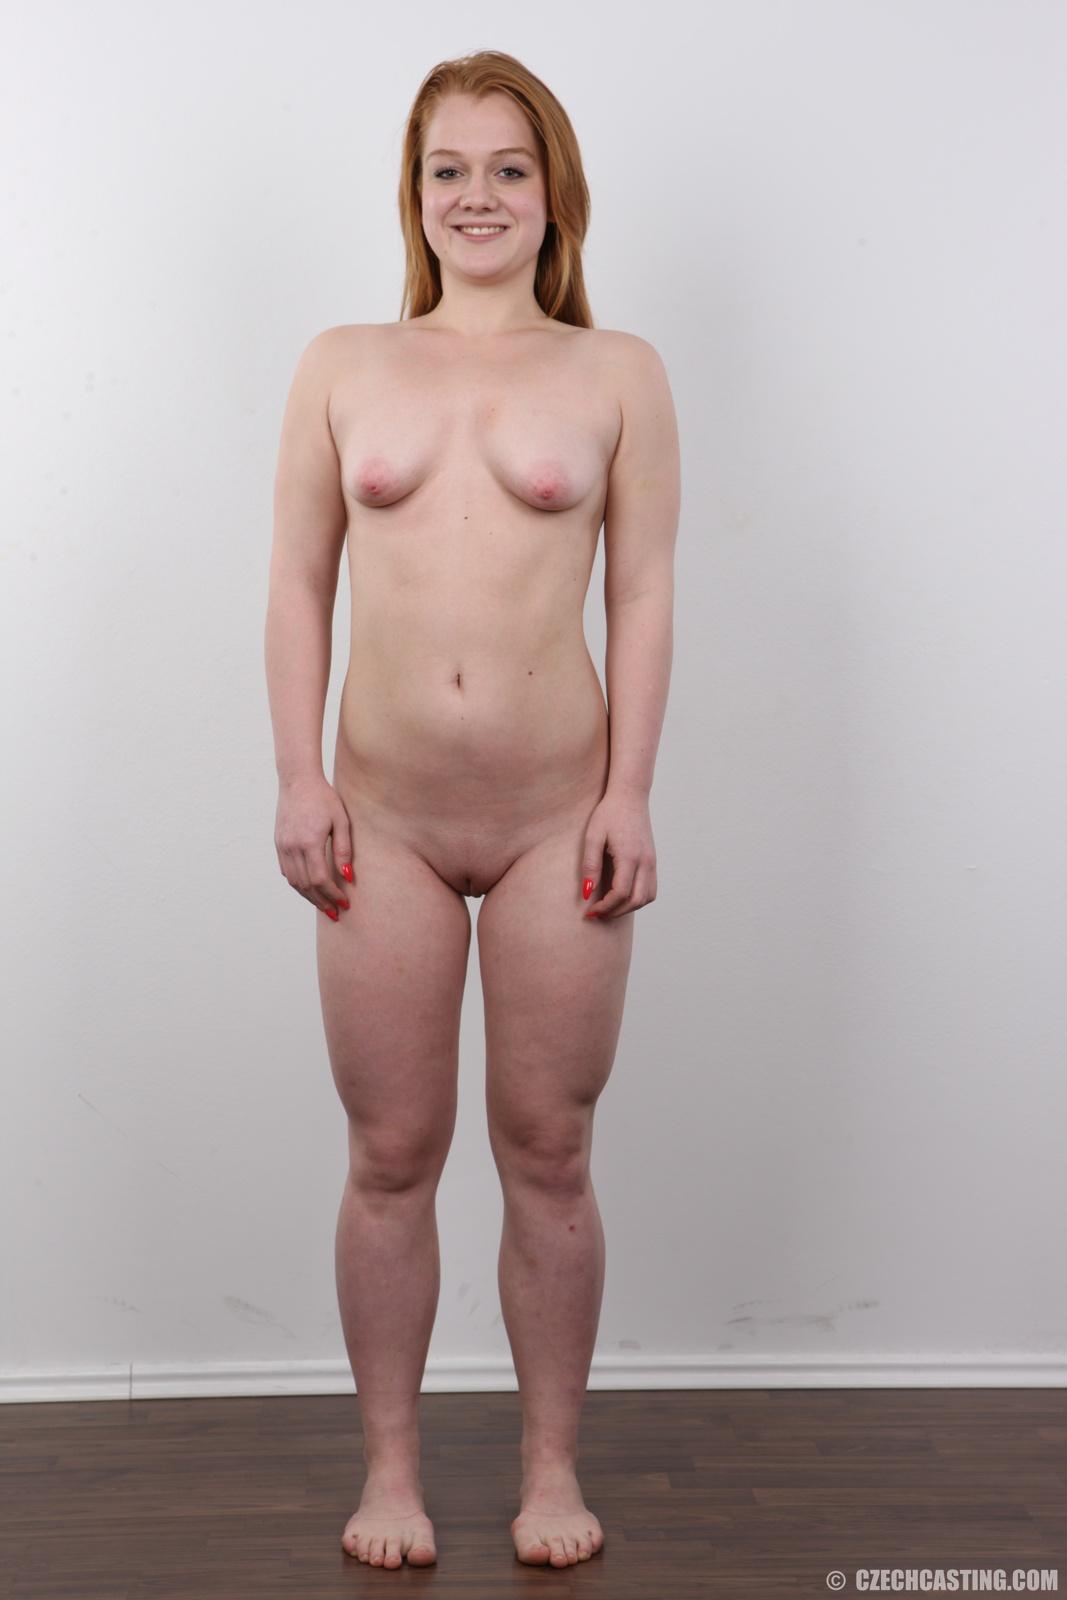 wpid-18-year-old-eliska-casting-photos26.jpg